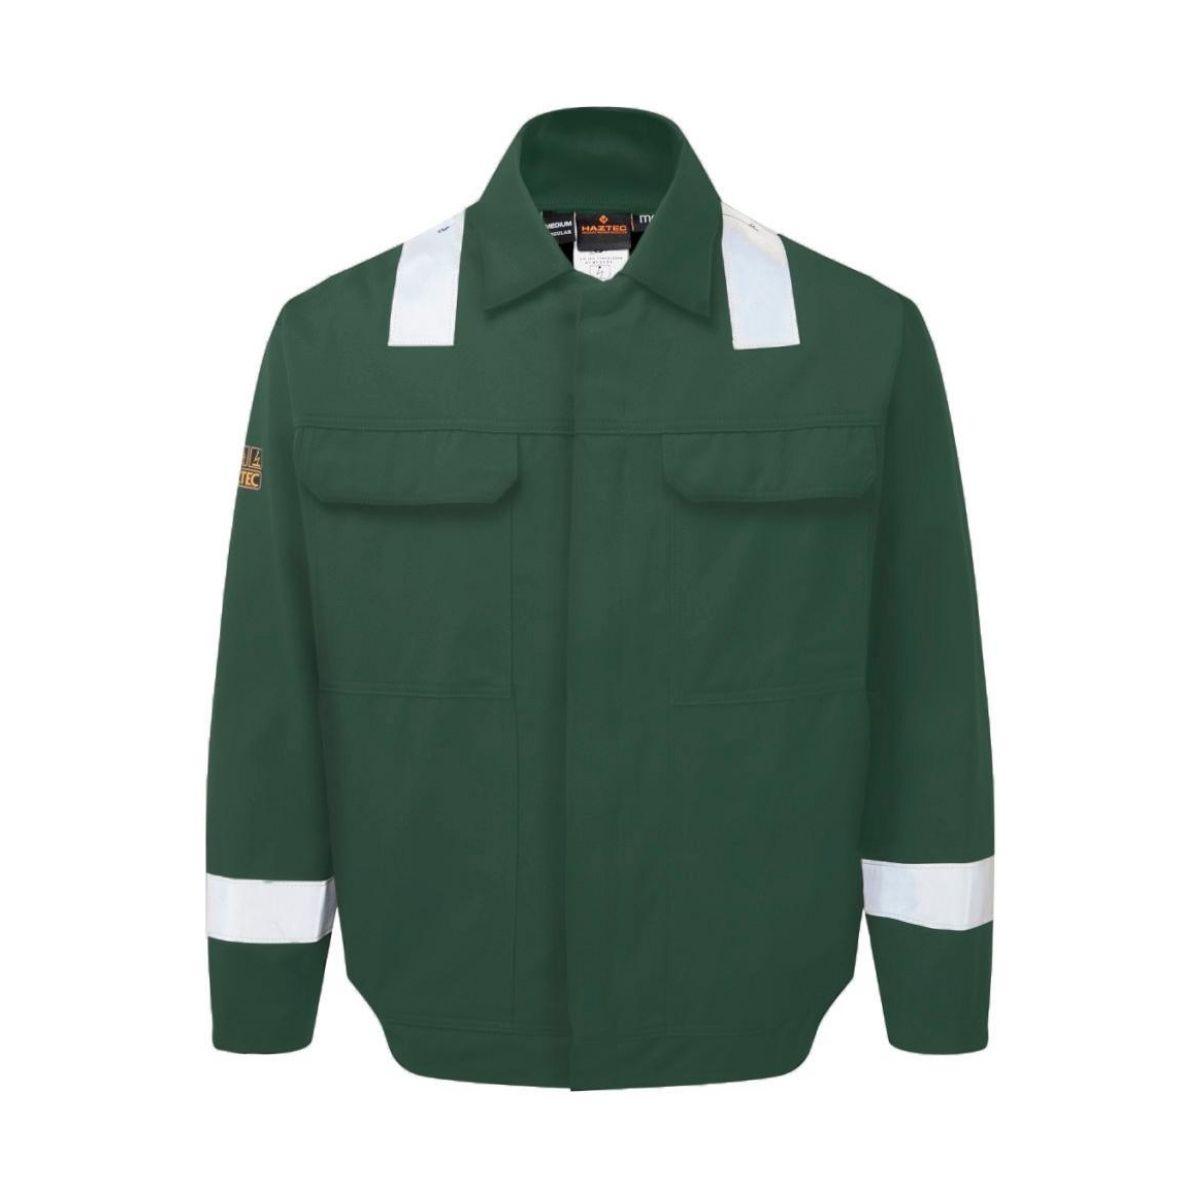 AS2313 HAZTEC® Sidra FR AS Inherent Driver Jacket - Green